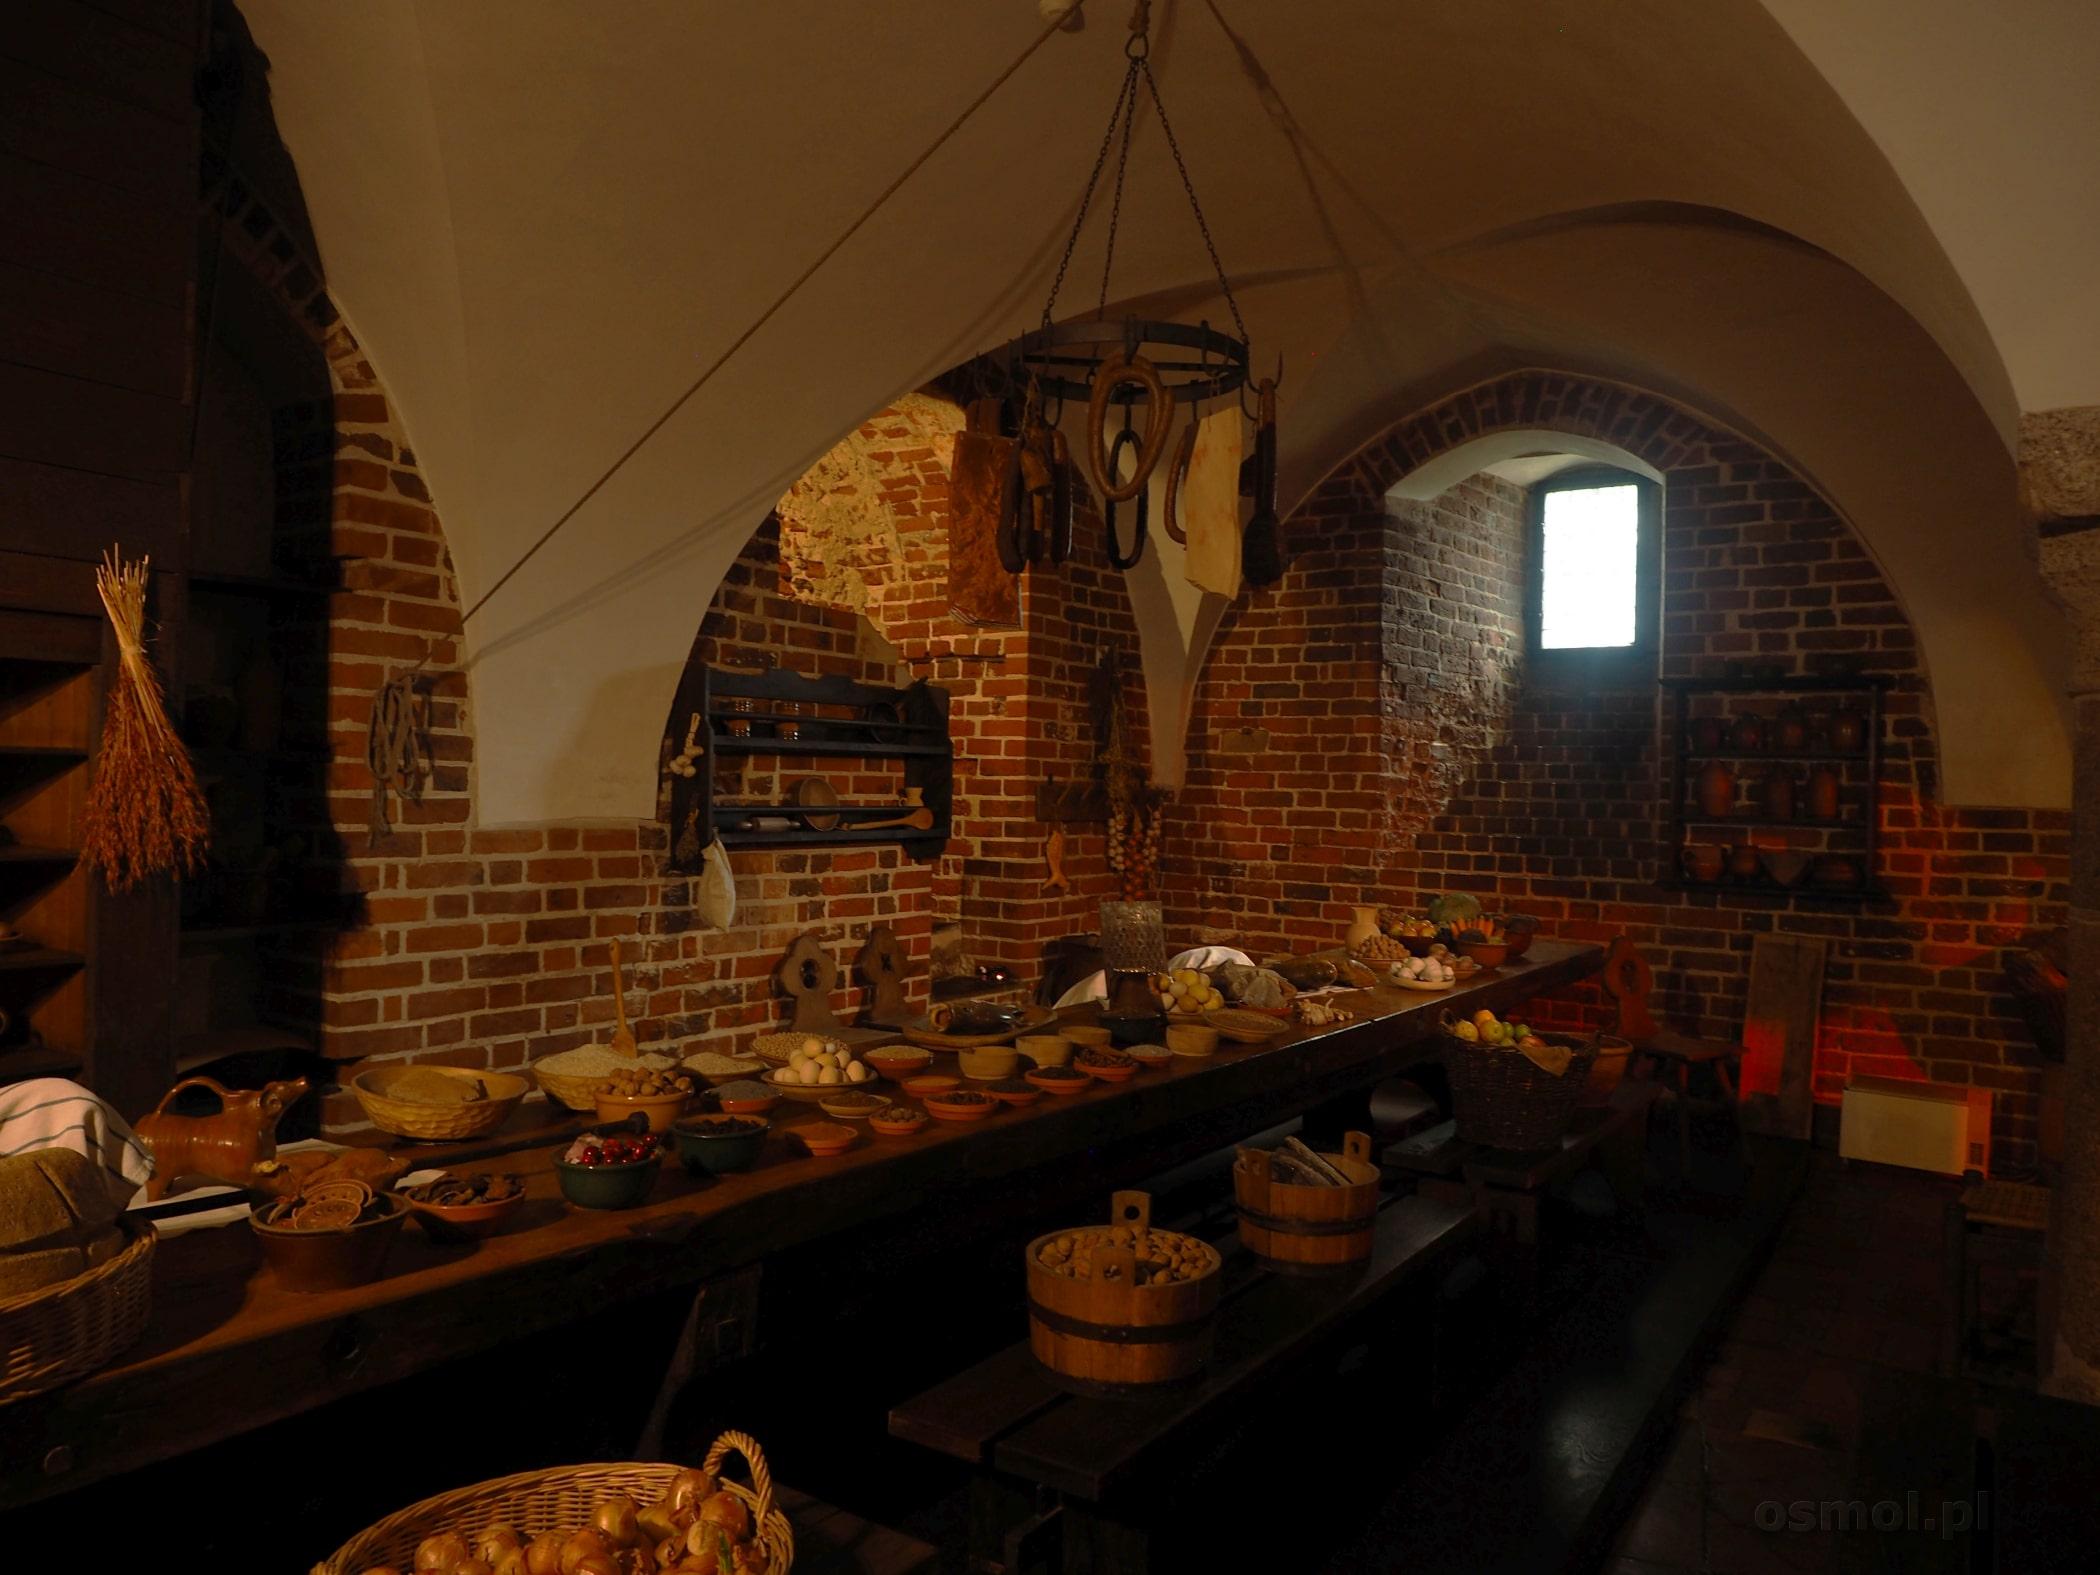 Kuchnia w zamku w Malborku